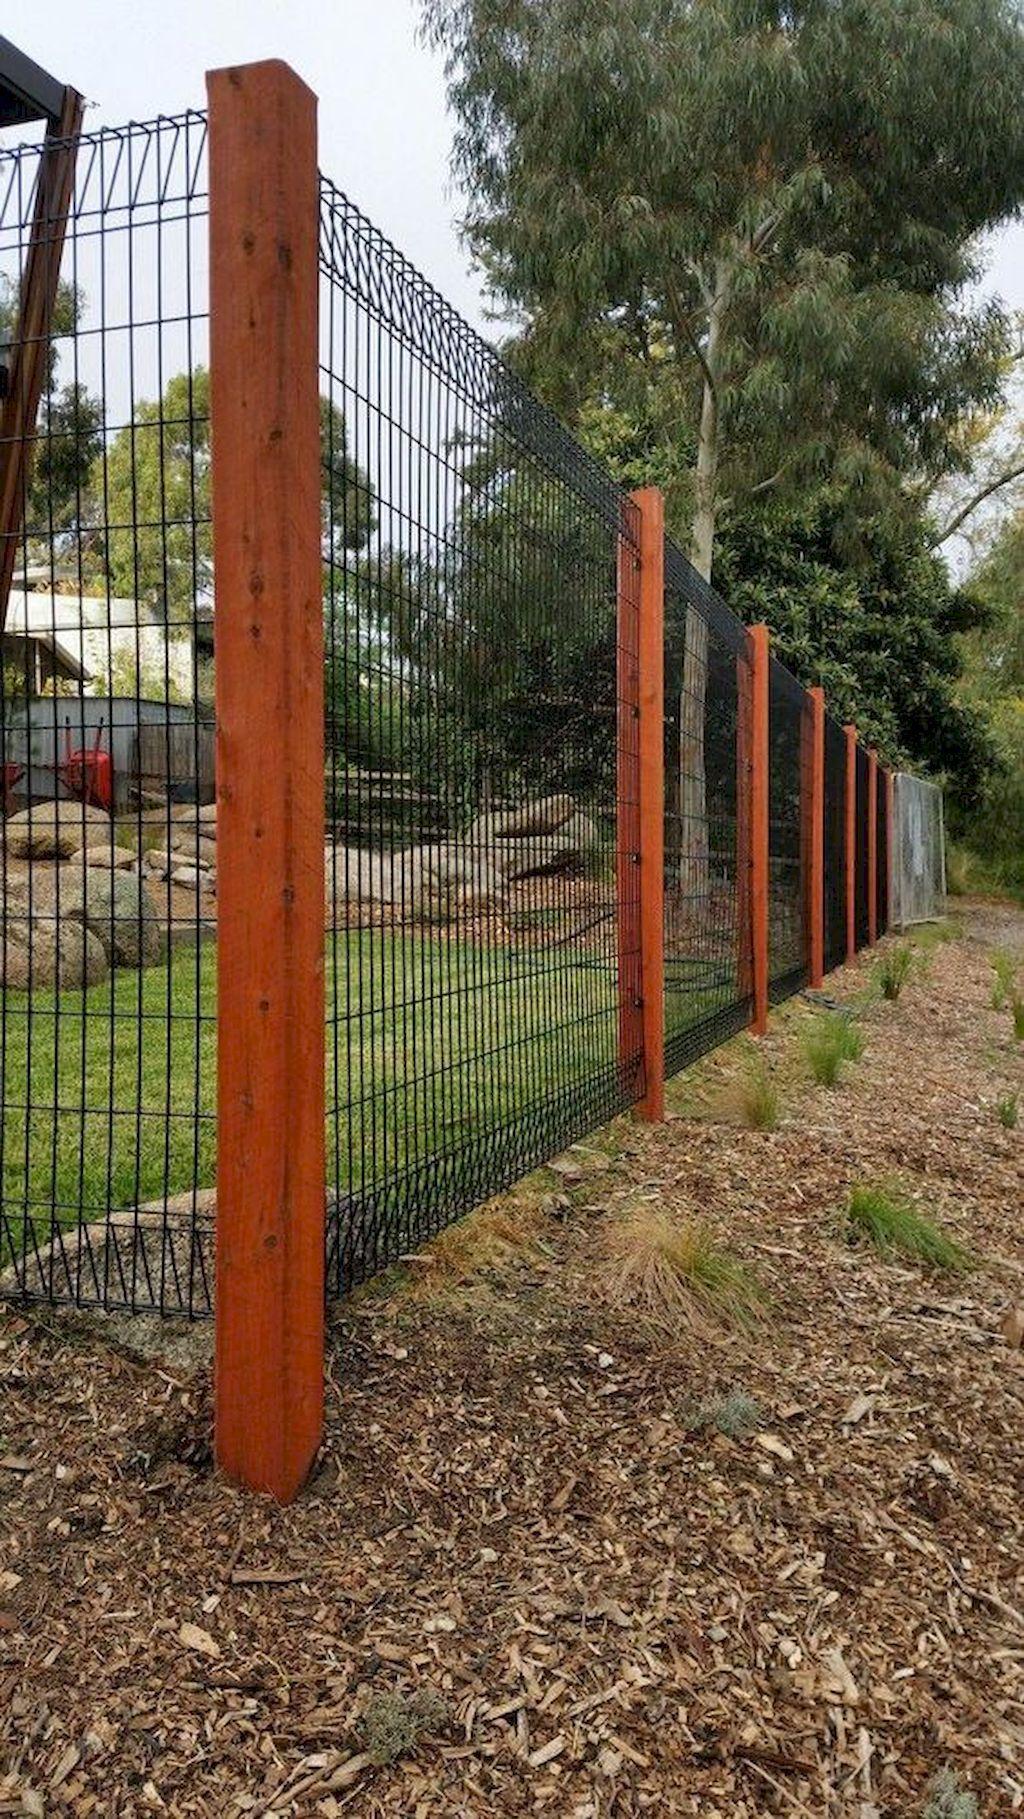 75 Easy Cheap Backyard Privacy Fence Design Ideas Backyard Fence Decor Backyard Fences Backyard Dog Area